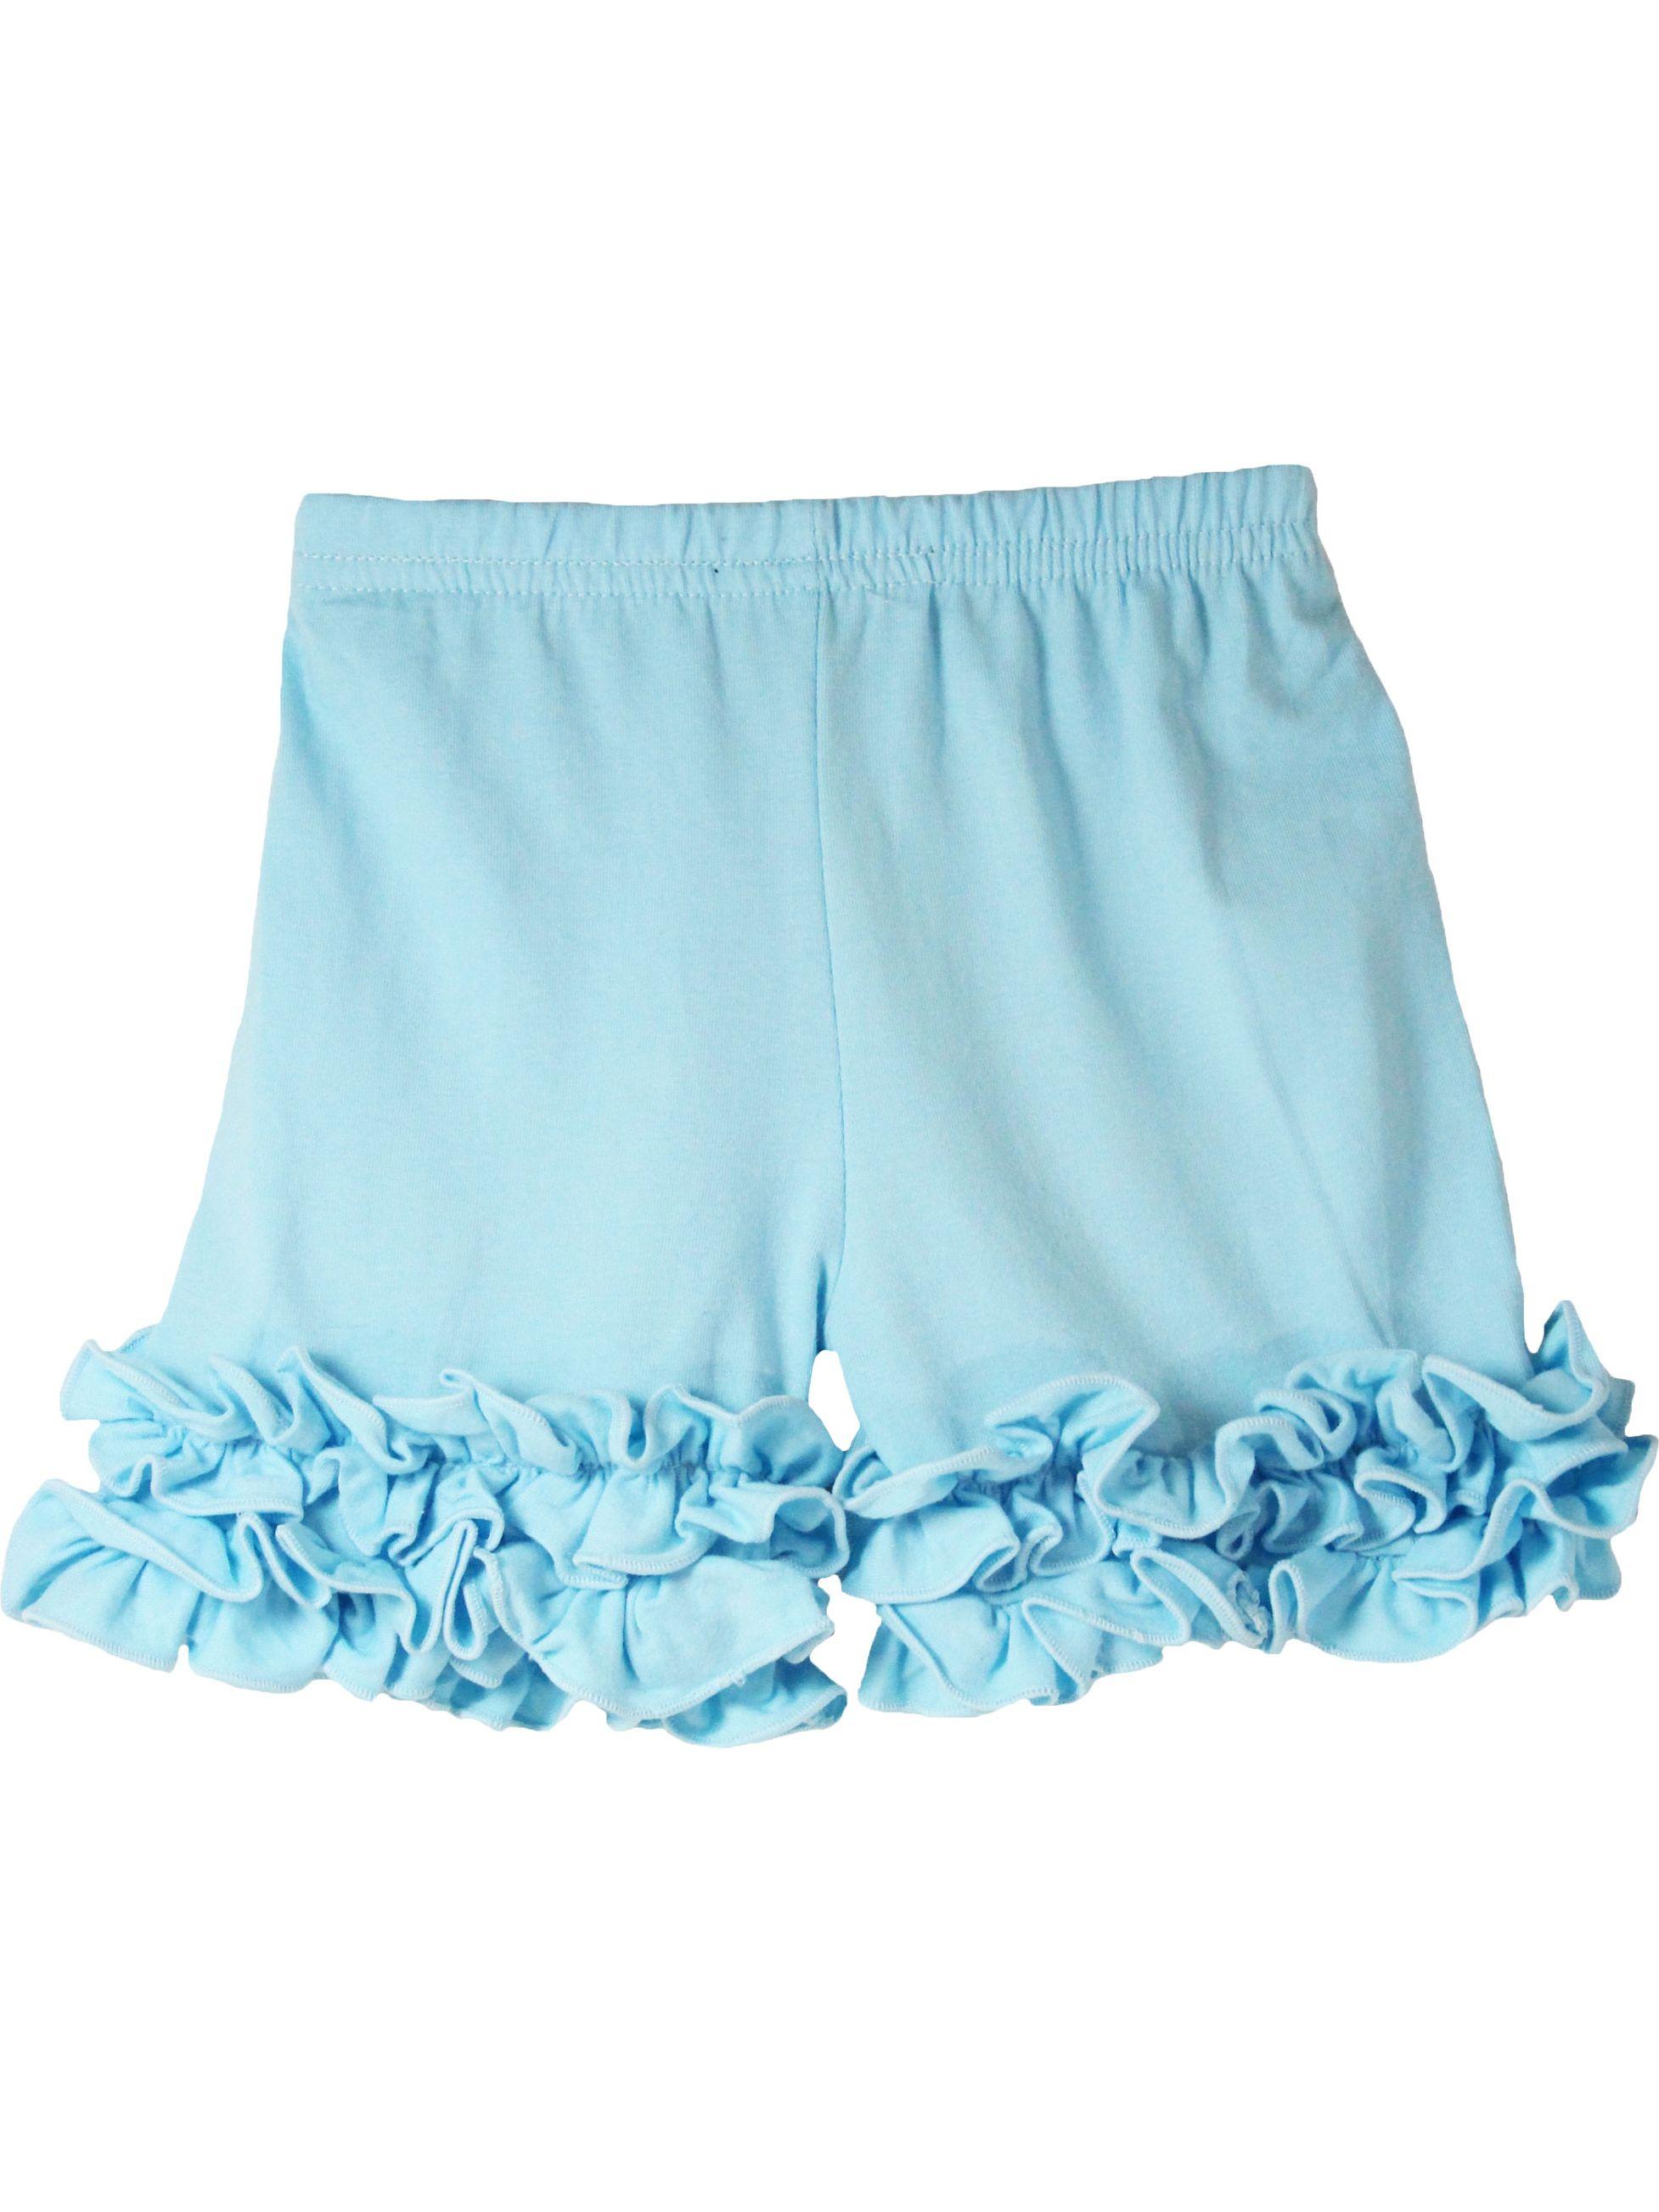 Girls Light Blue Elastic Waist Ruffle Bottom Icing Boutique Shorts